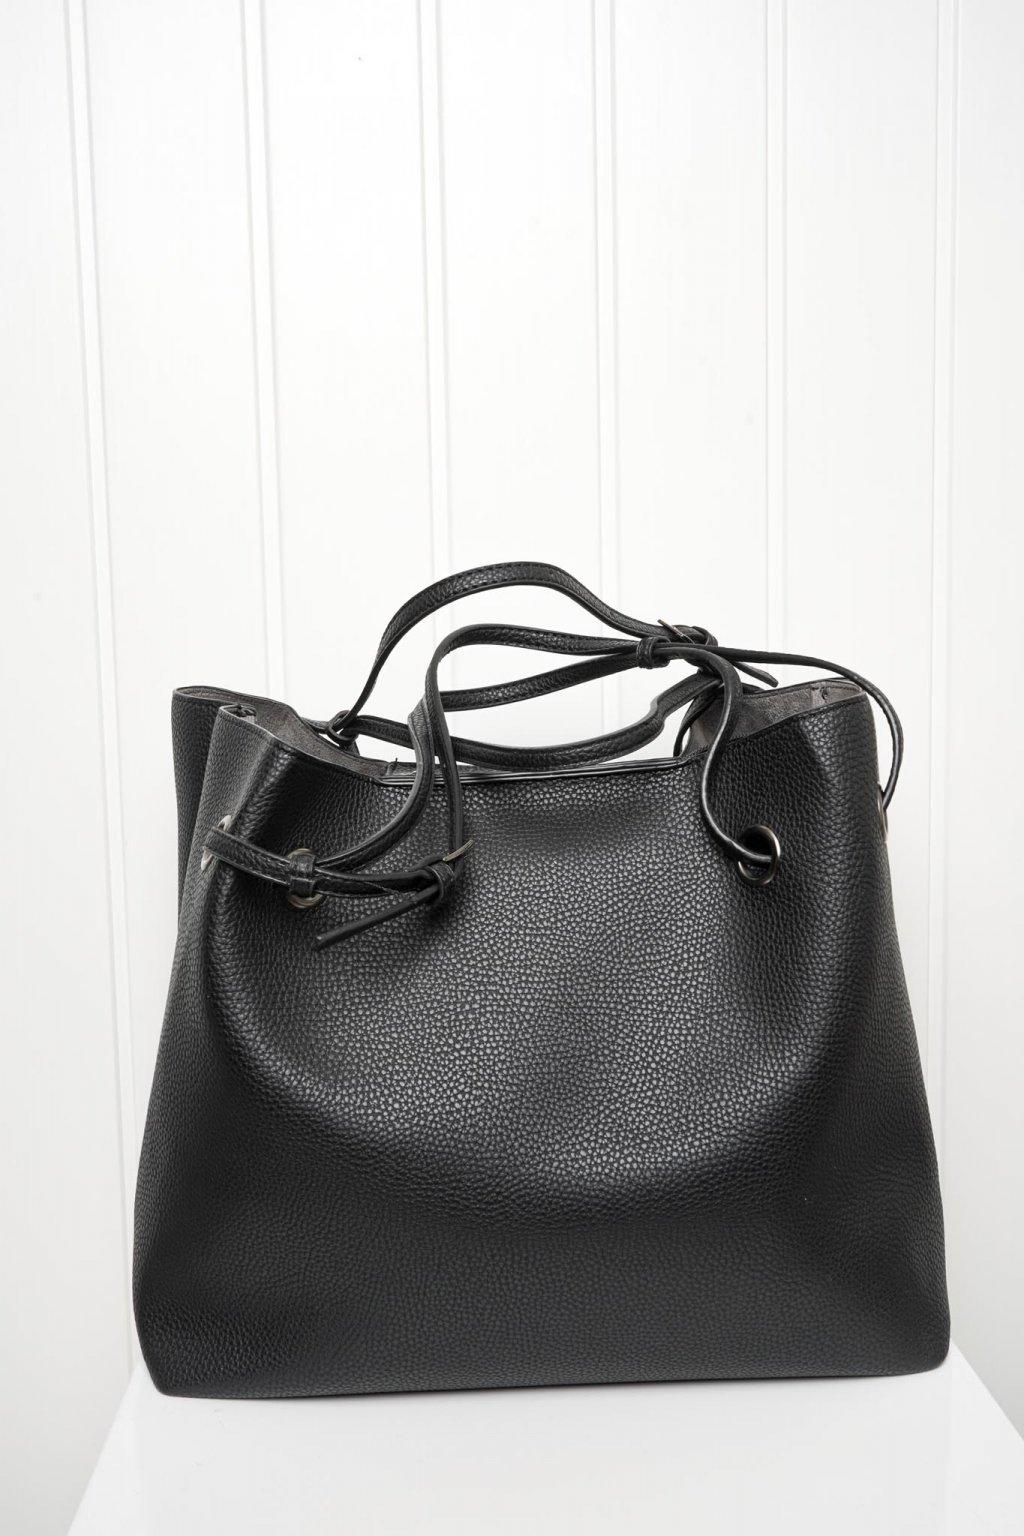 Kabelka, crossbody, ruksak, shopping bag, shopperka, 020